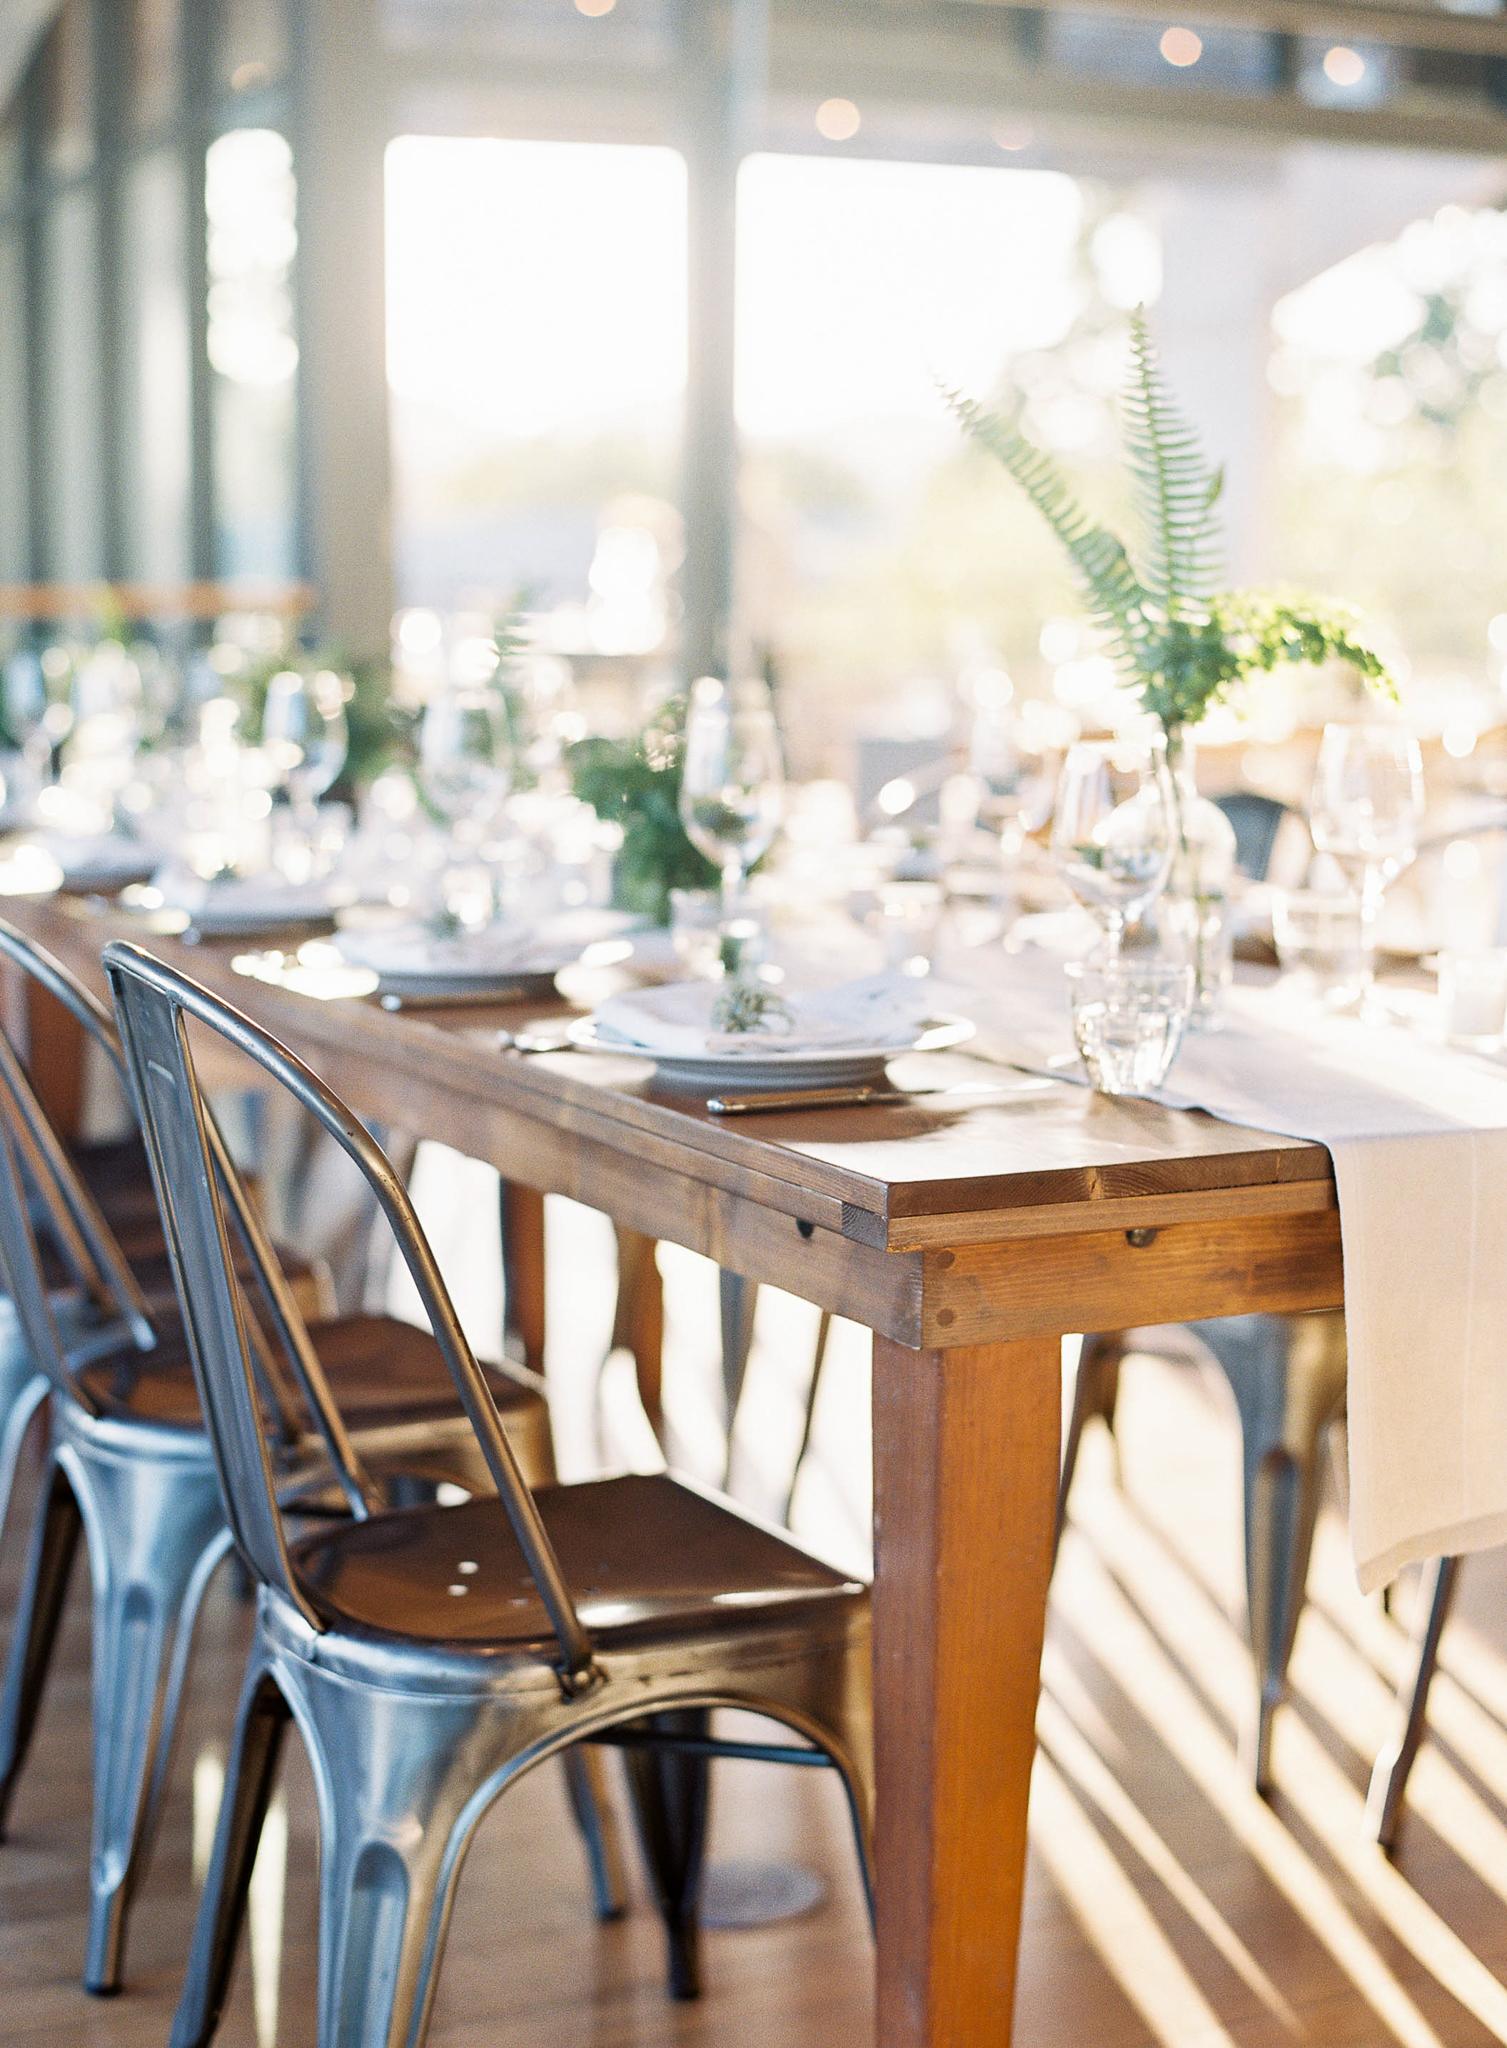 Meghan Mehan Photography - Fine Art Film Wedding Photography - San Francisco   Napa   Sonoma   Big Sur   Chicago   Minneapolis   Milwaukee   Lake Geneva   Door County   Wisconsin 065.jpg